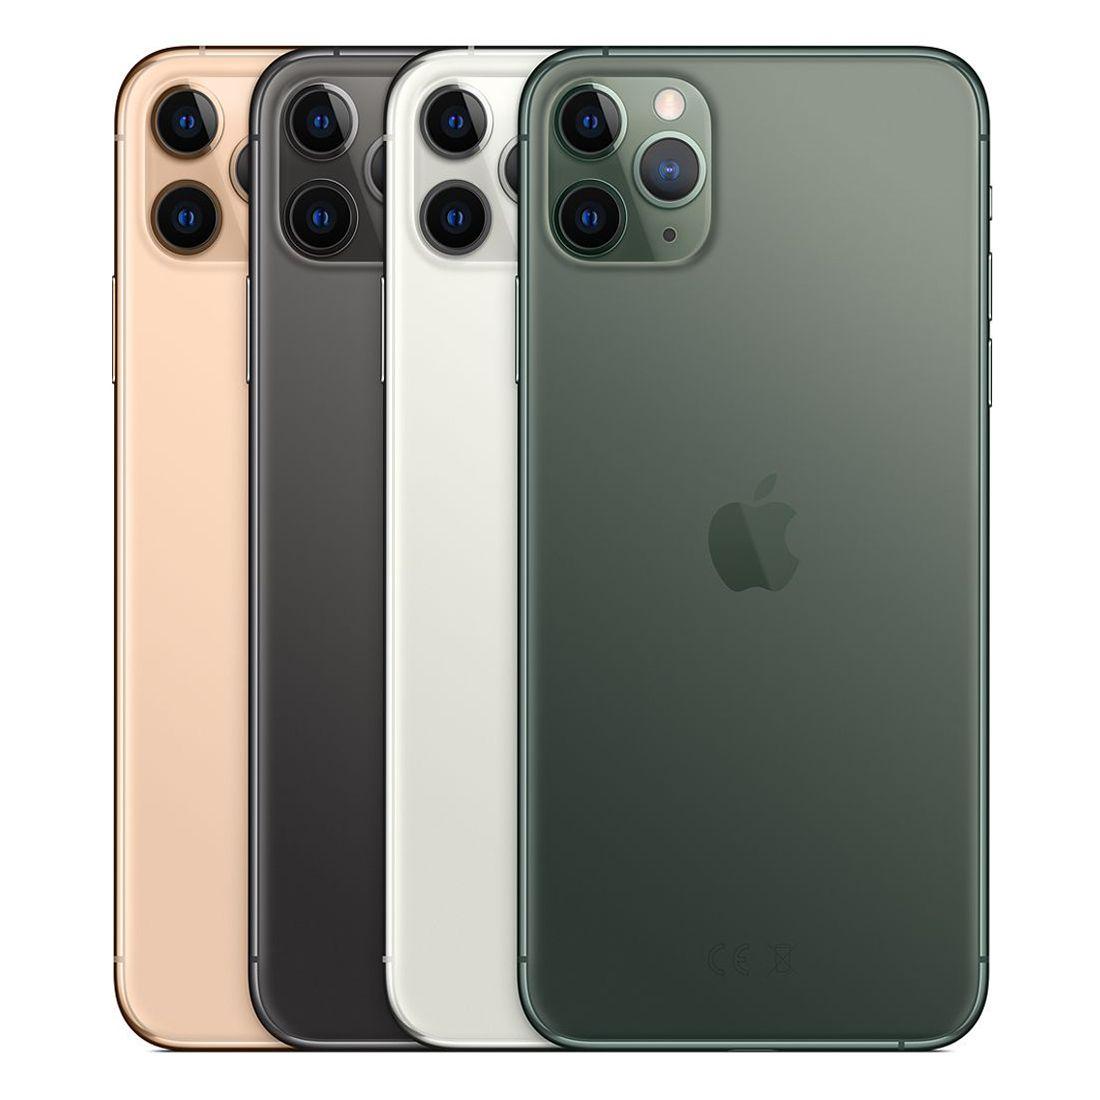 Apple iPhone 11 Pro Max 64GB - Silver